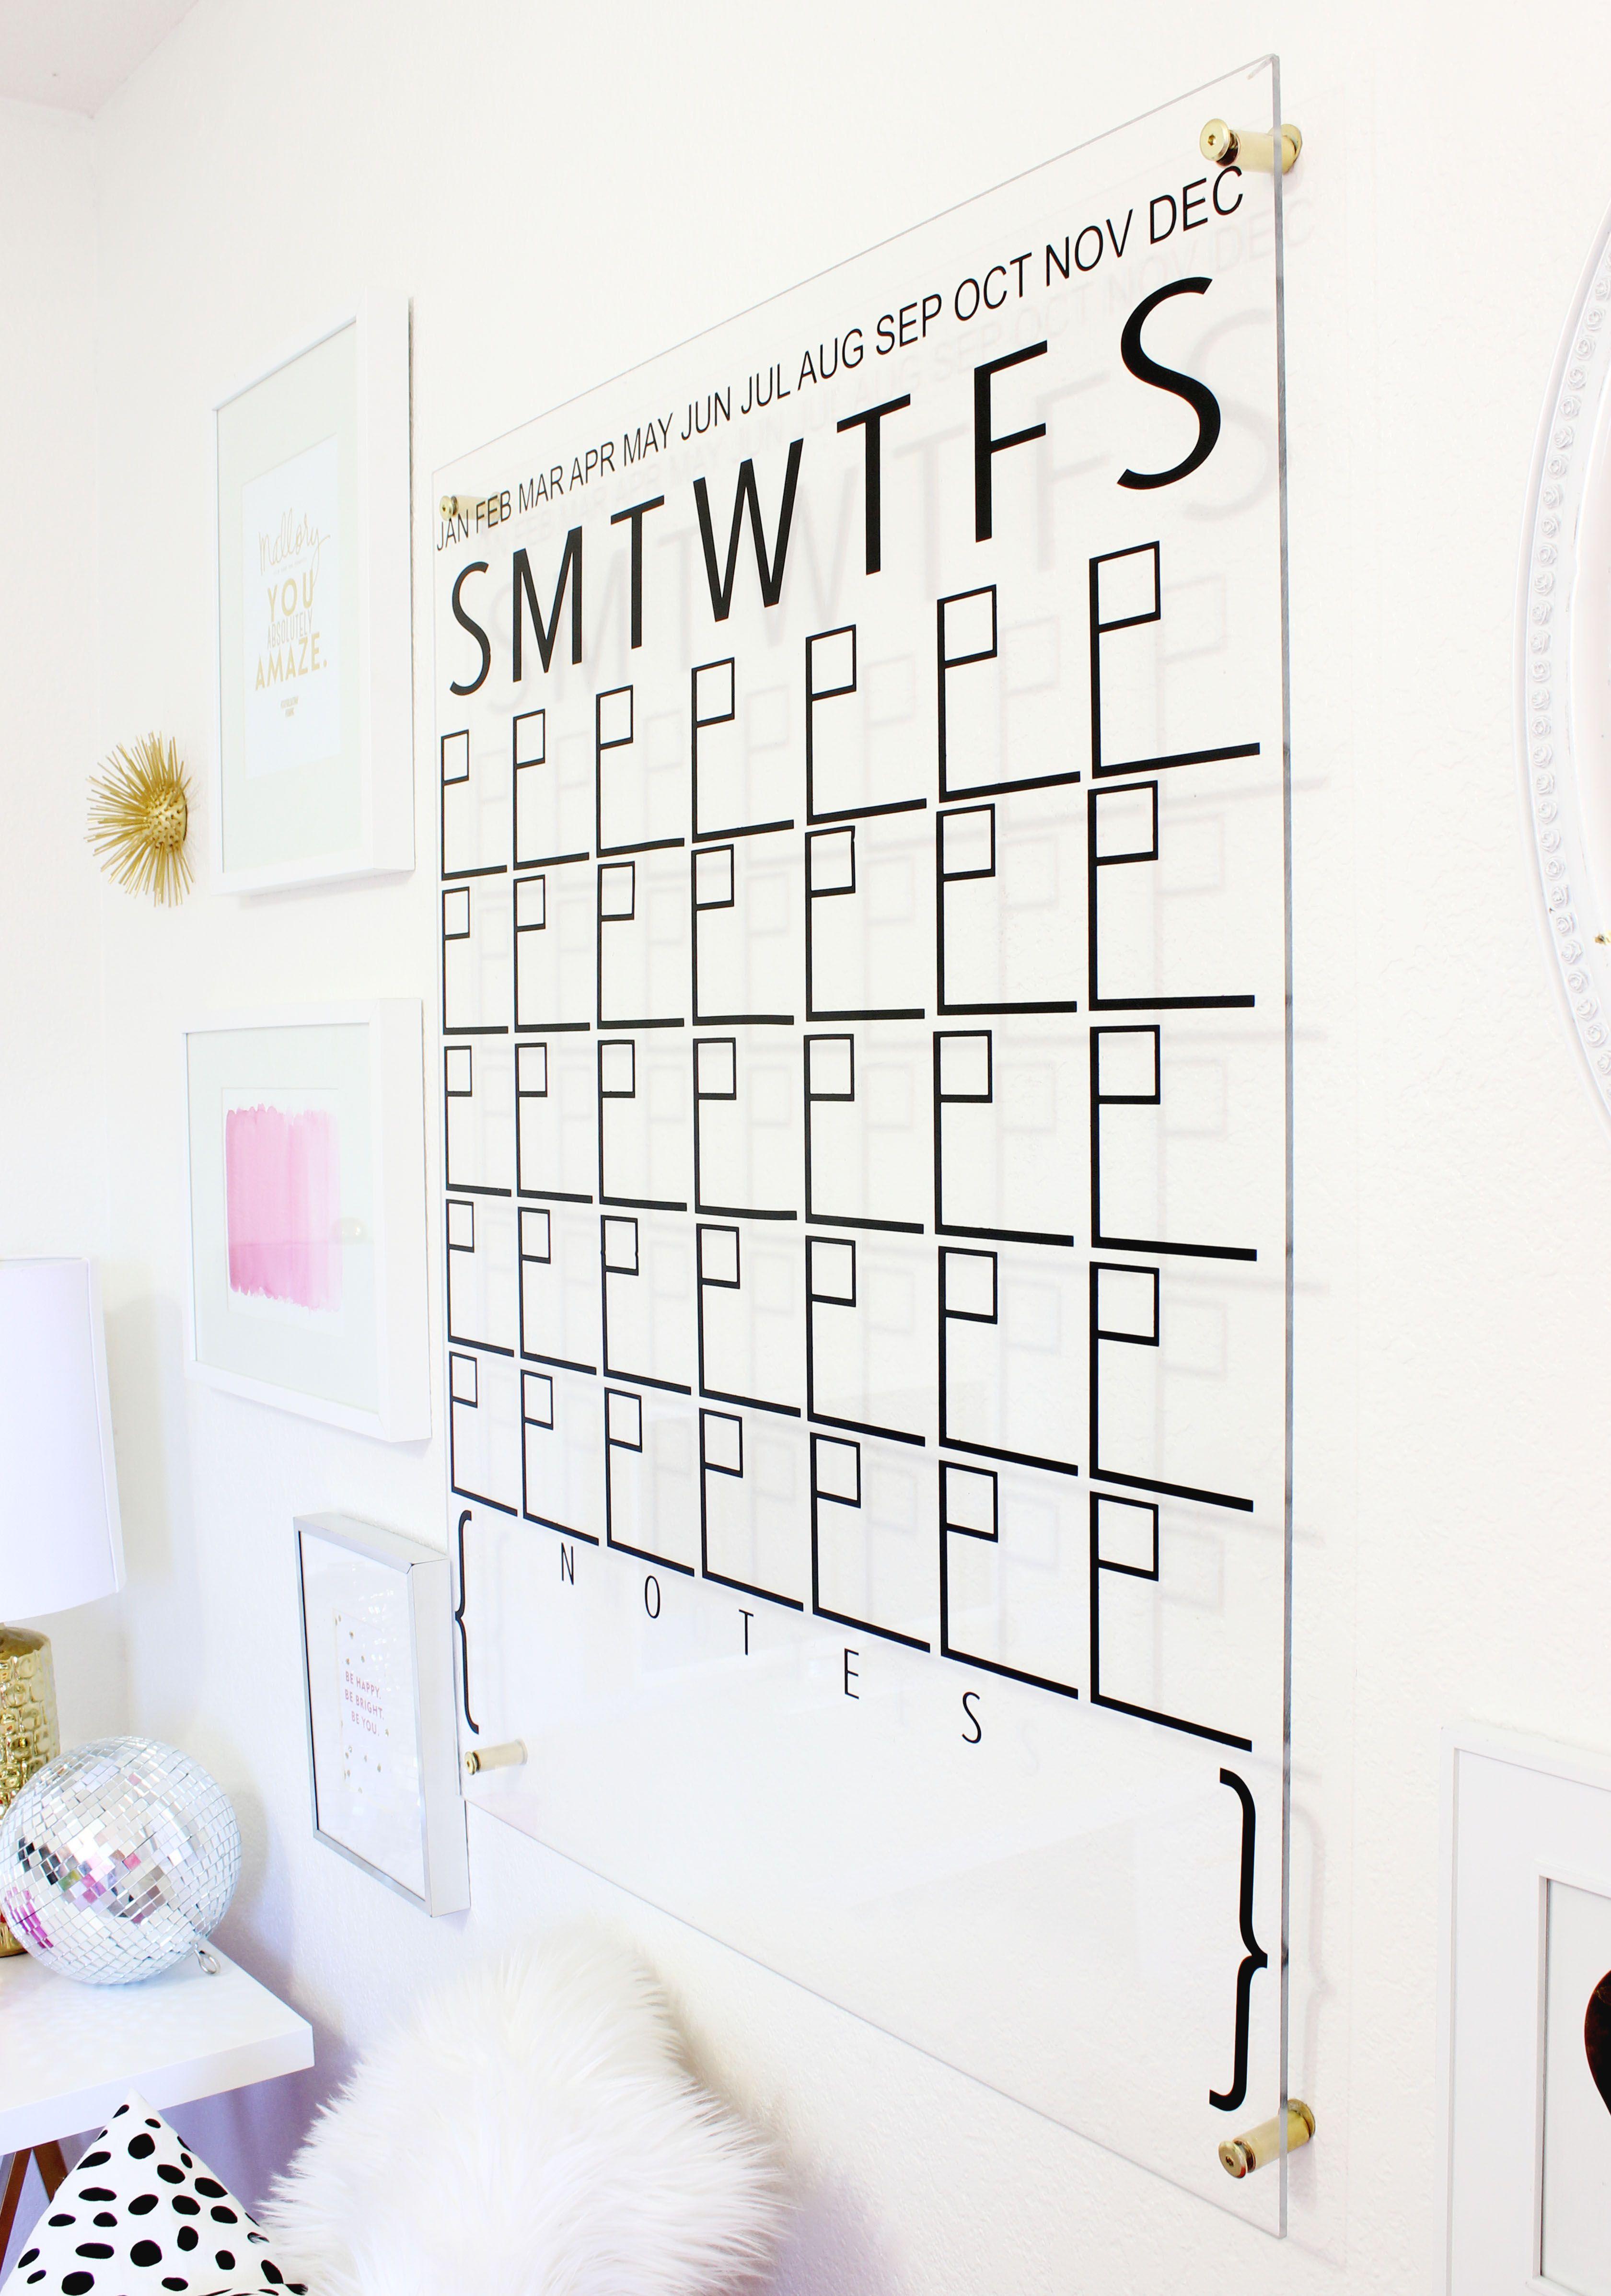 Year Calendar Officeworks : Diy acrylic calendar pinterest